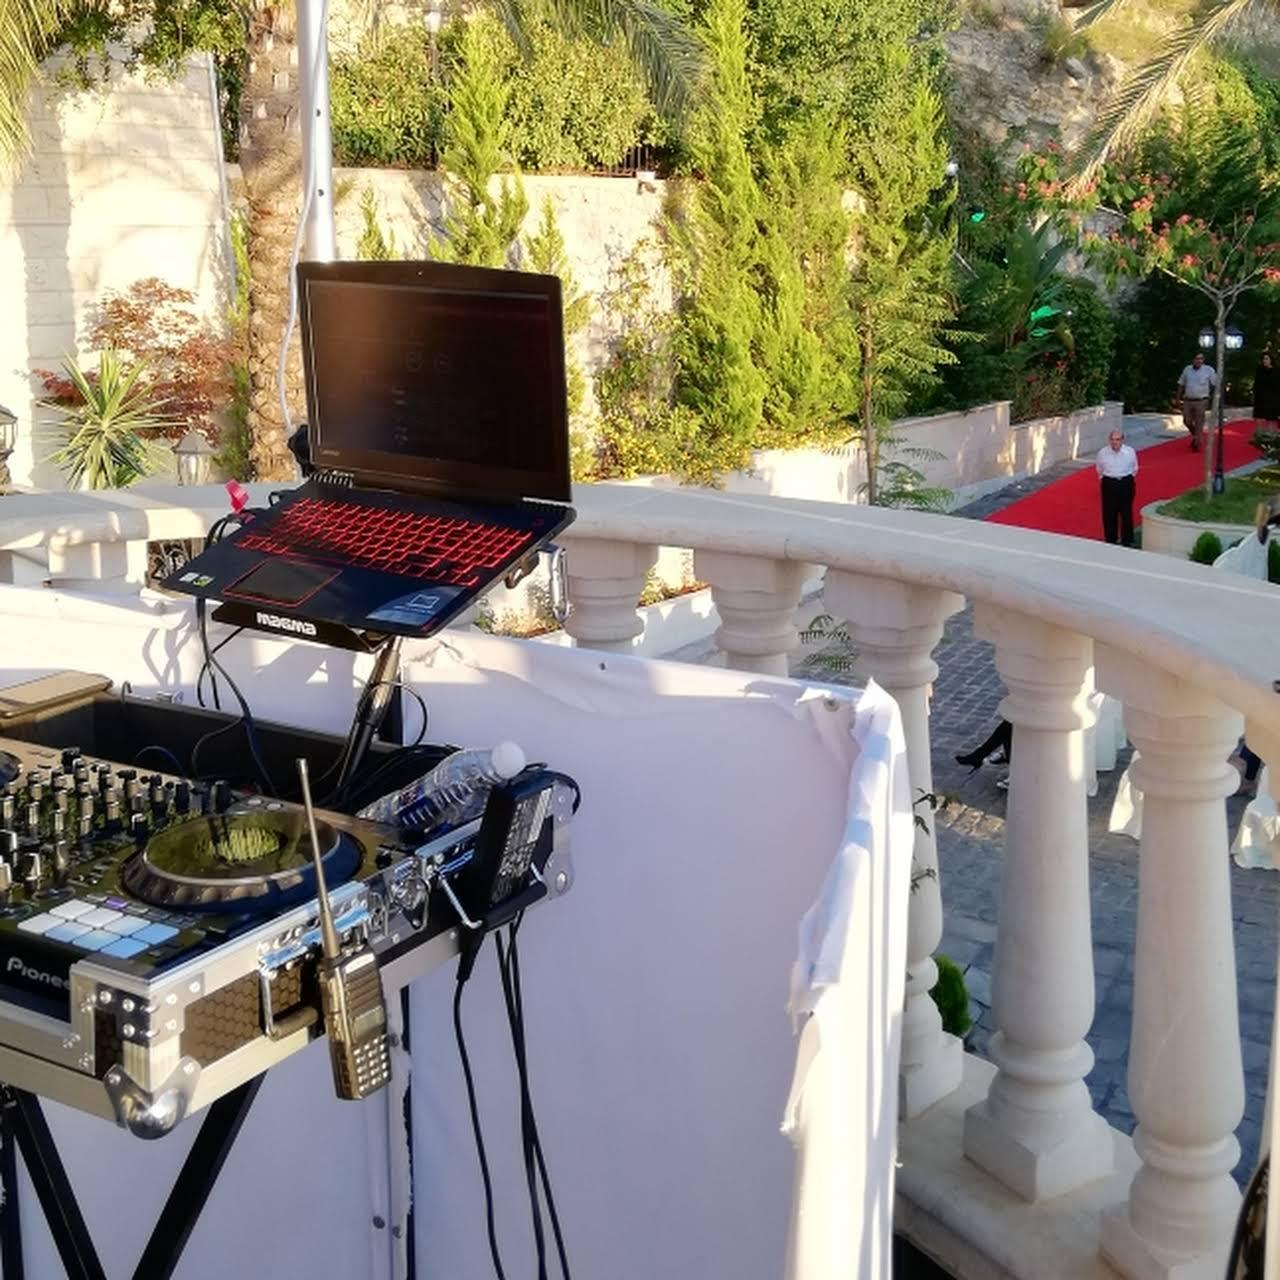 Music Pros Lebanon ( DJs & Event Supplies ) - Sound & Light